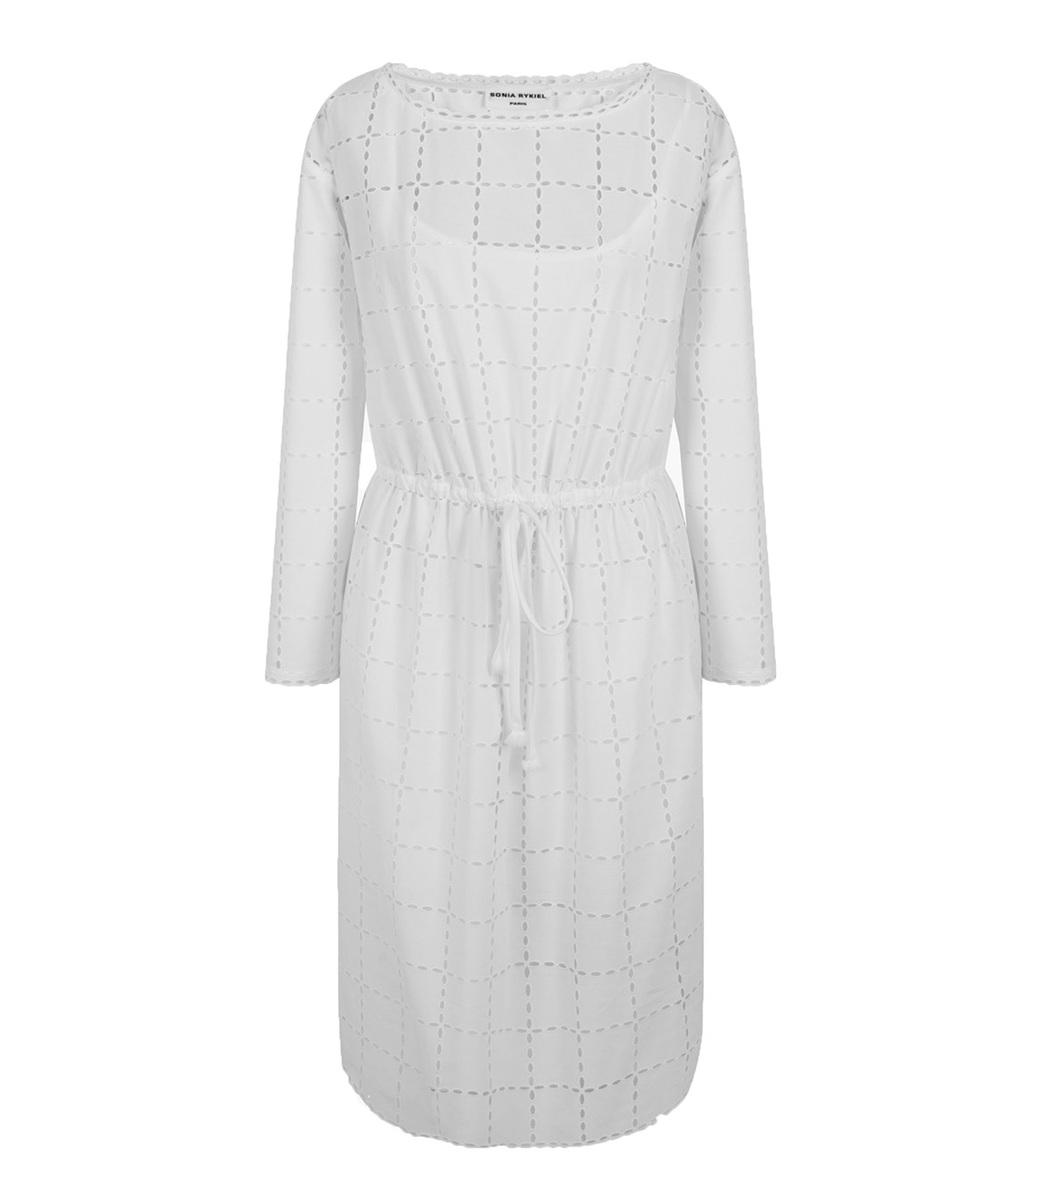 Sonia Rykiel White Broderie Anglaise Dress